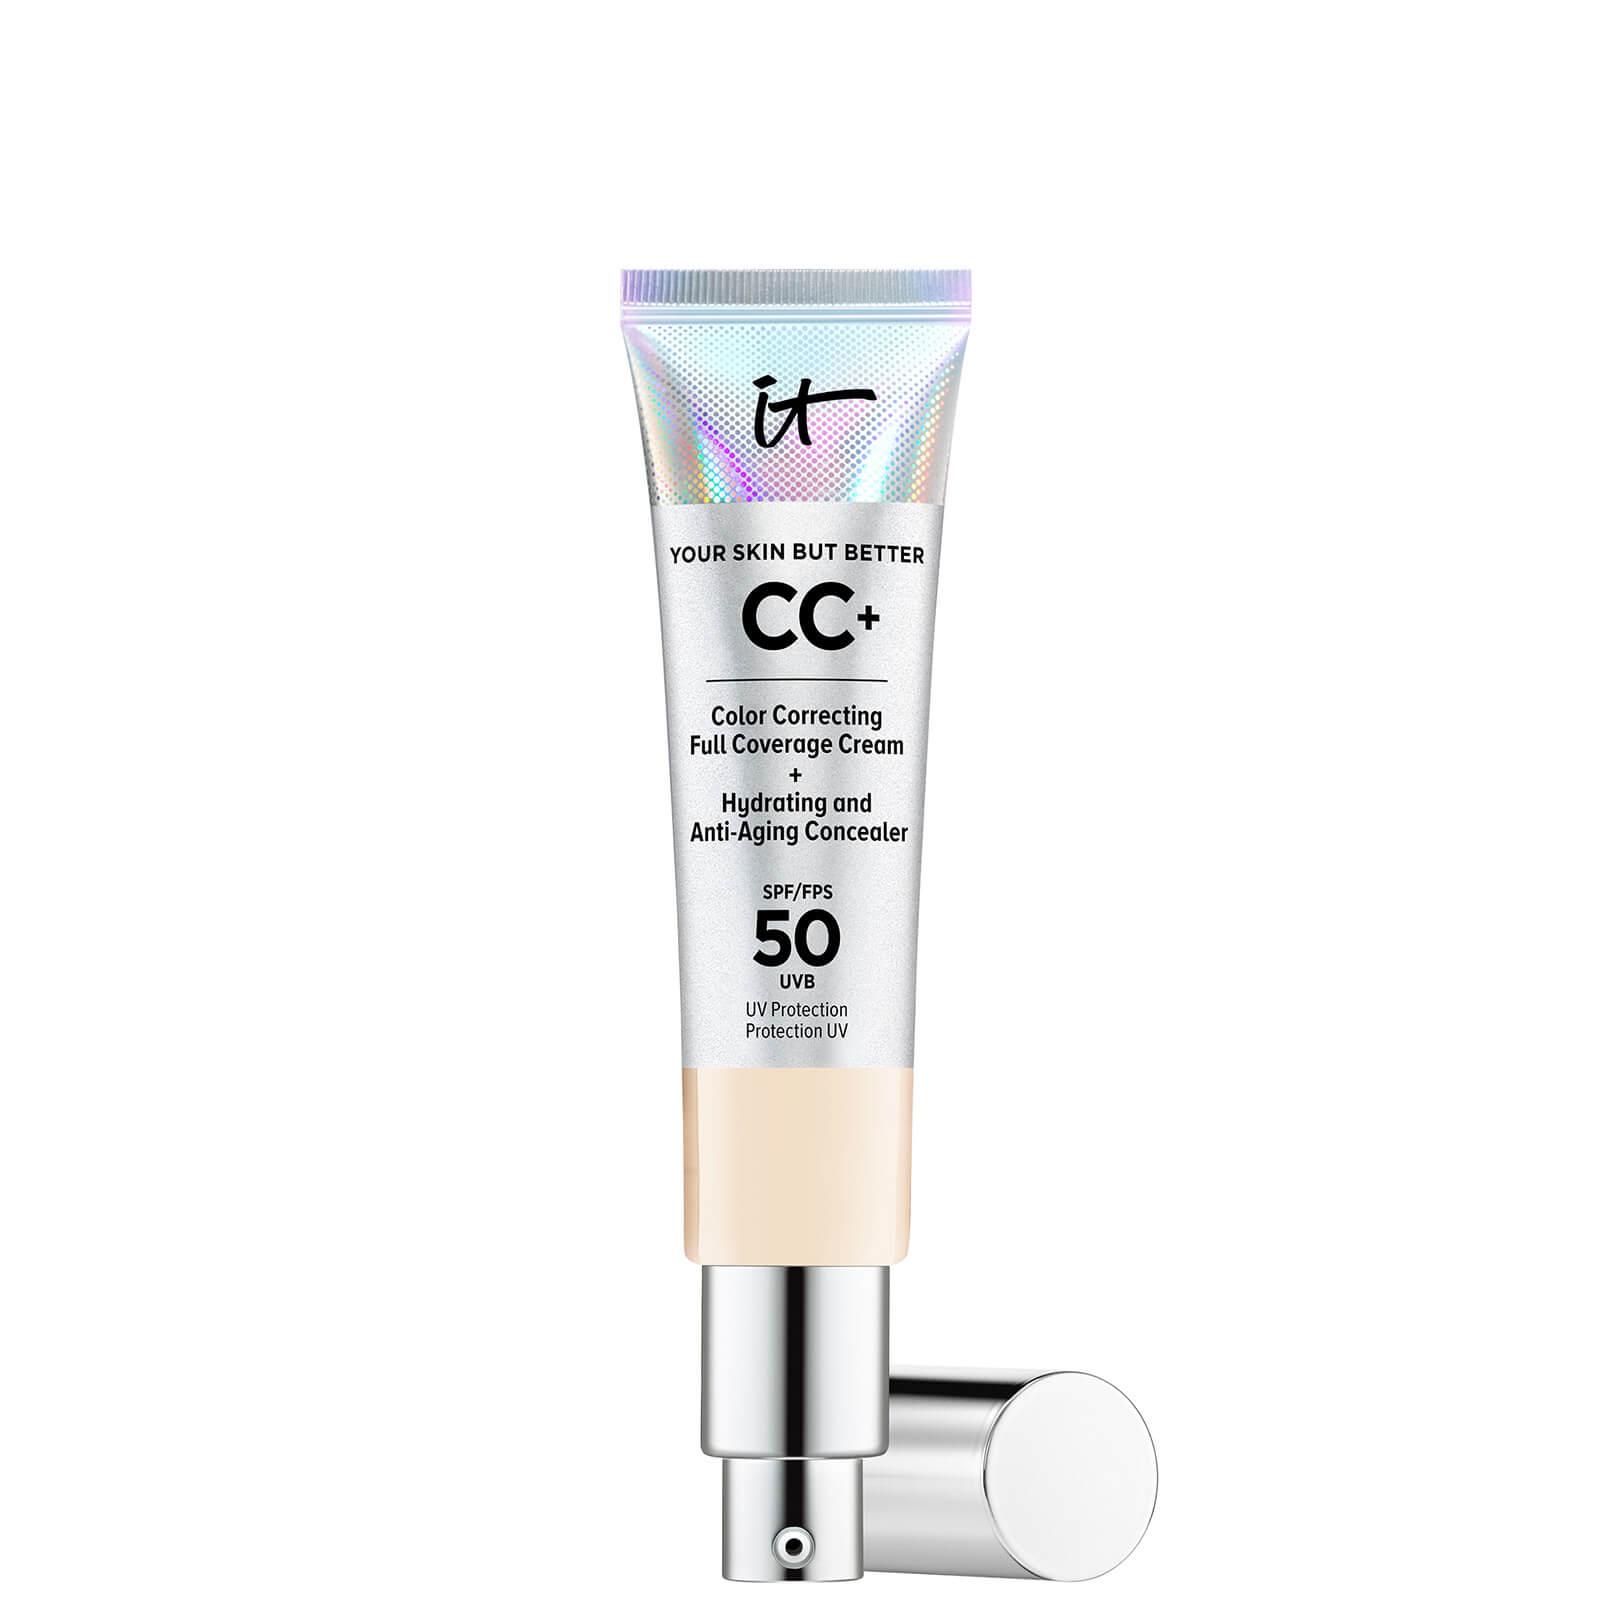 Купить IT Cosmetics Your Skin But Better CC+ Cream with SPF50 32ml (Various Shades) - Fair Ivory